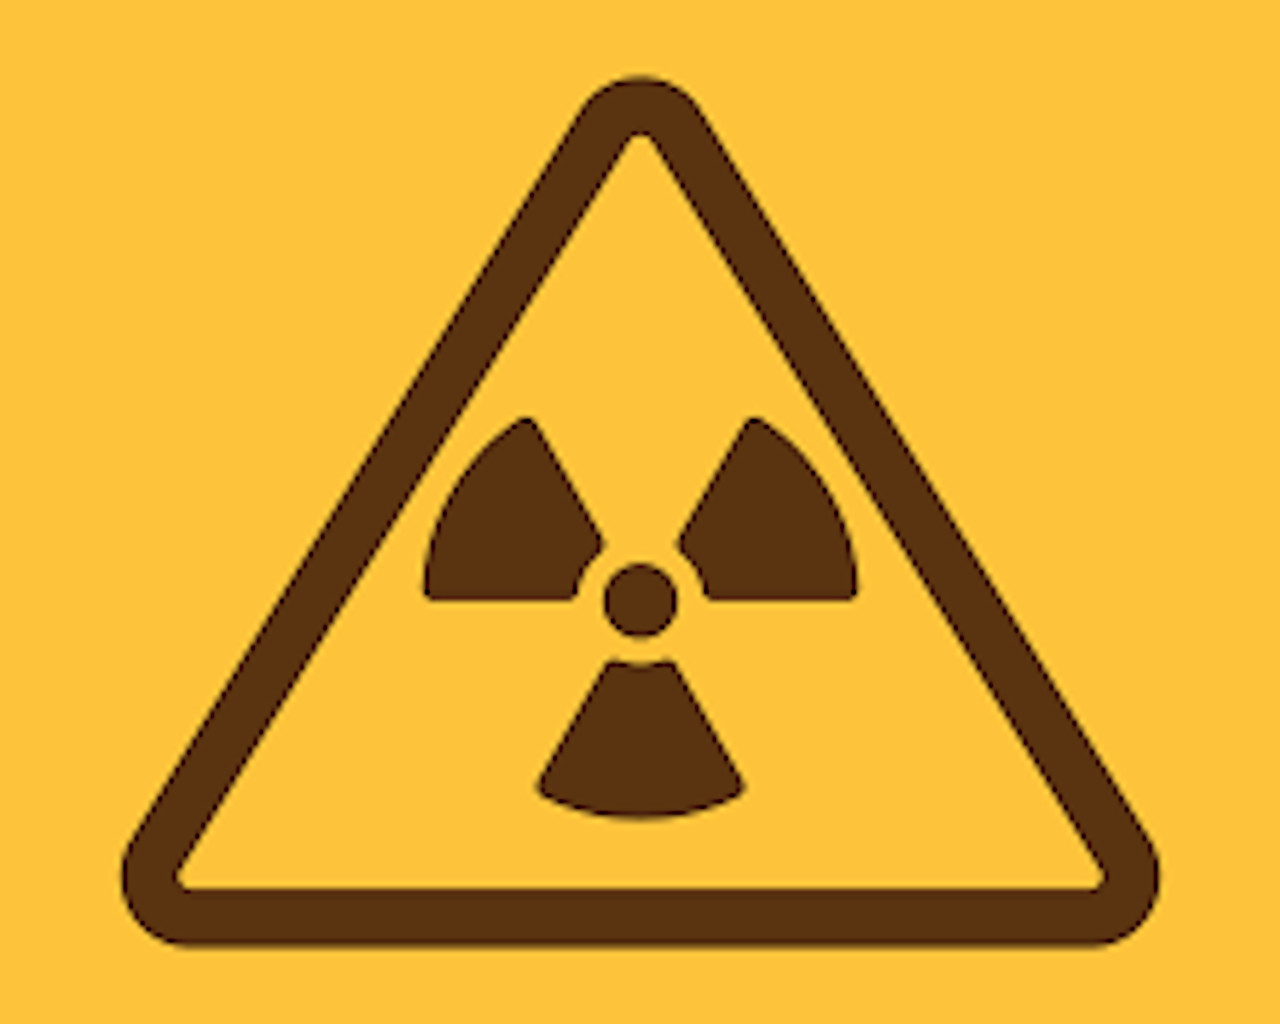 ακτινοβολια,ακτινοβολια κινητων xiaomi,ακτινοβολια κινητου,ακτινοβολια παρενεργειεσ,ακτινοβολια κινητων καρκινοσ,ακτινοβολια κινητων 2020,ακτινοβολια αγγλικα,ακτινοβολια γ